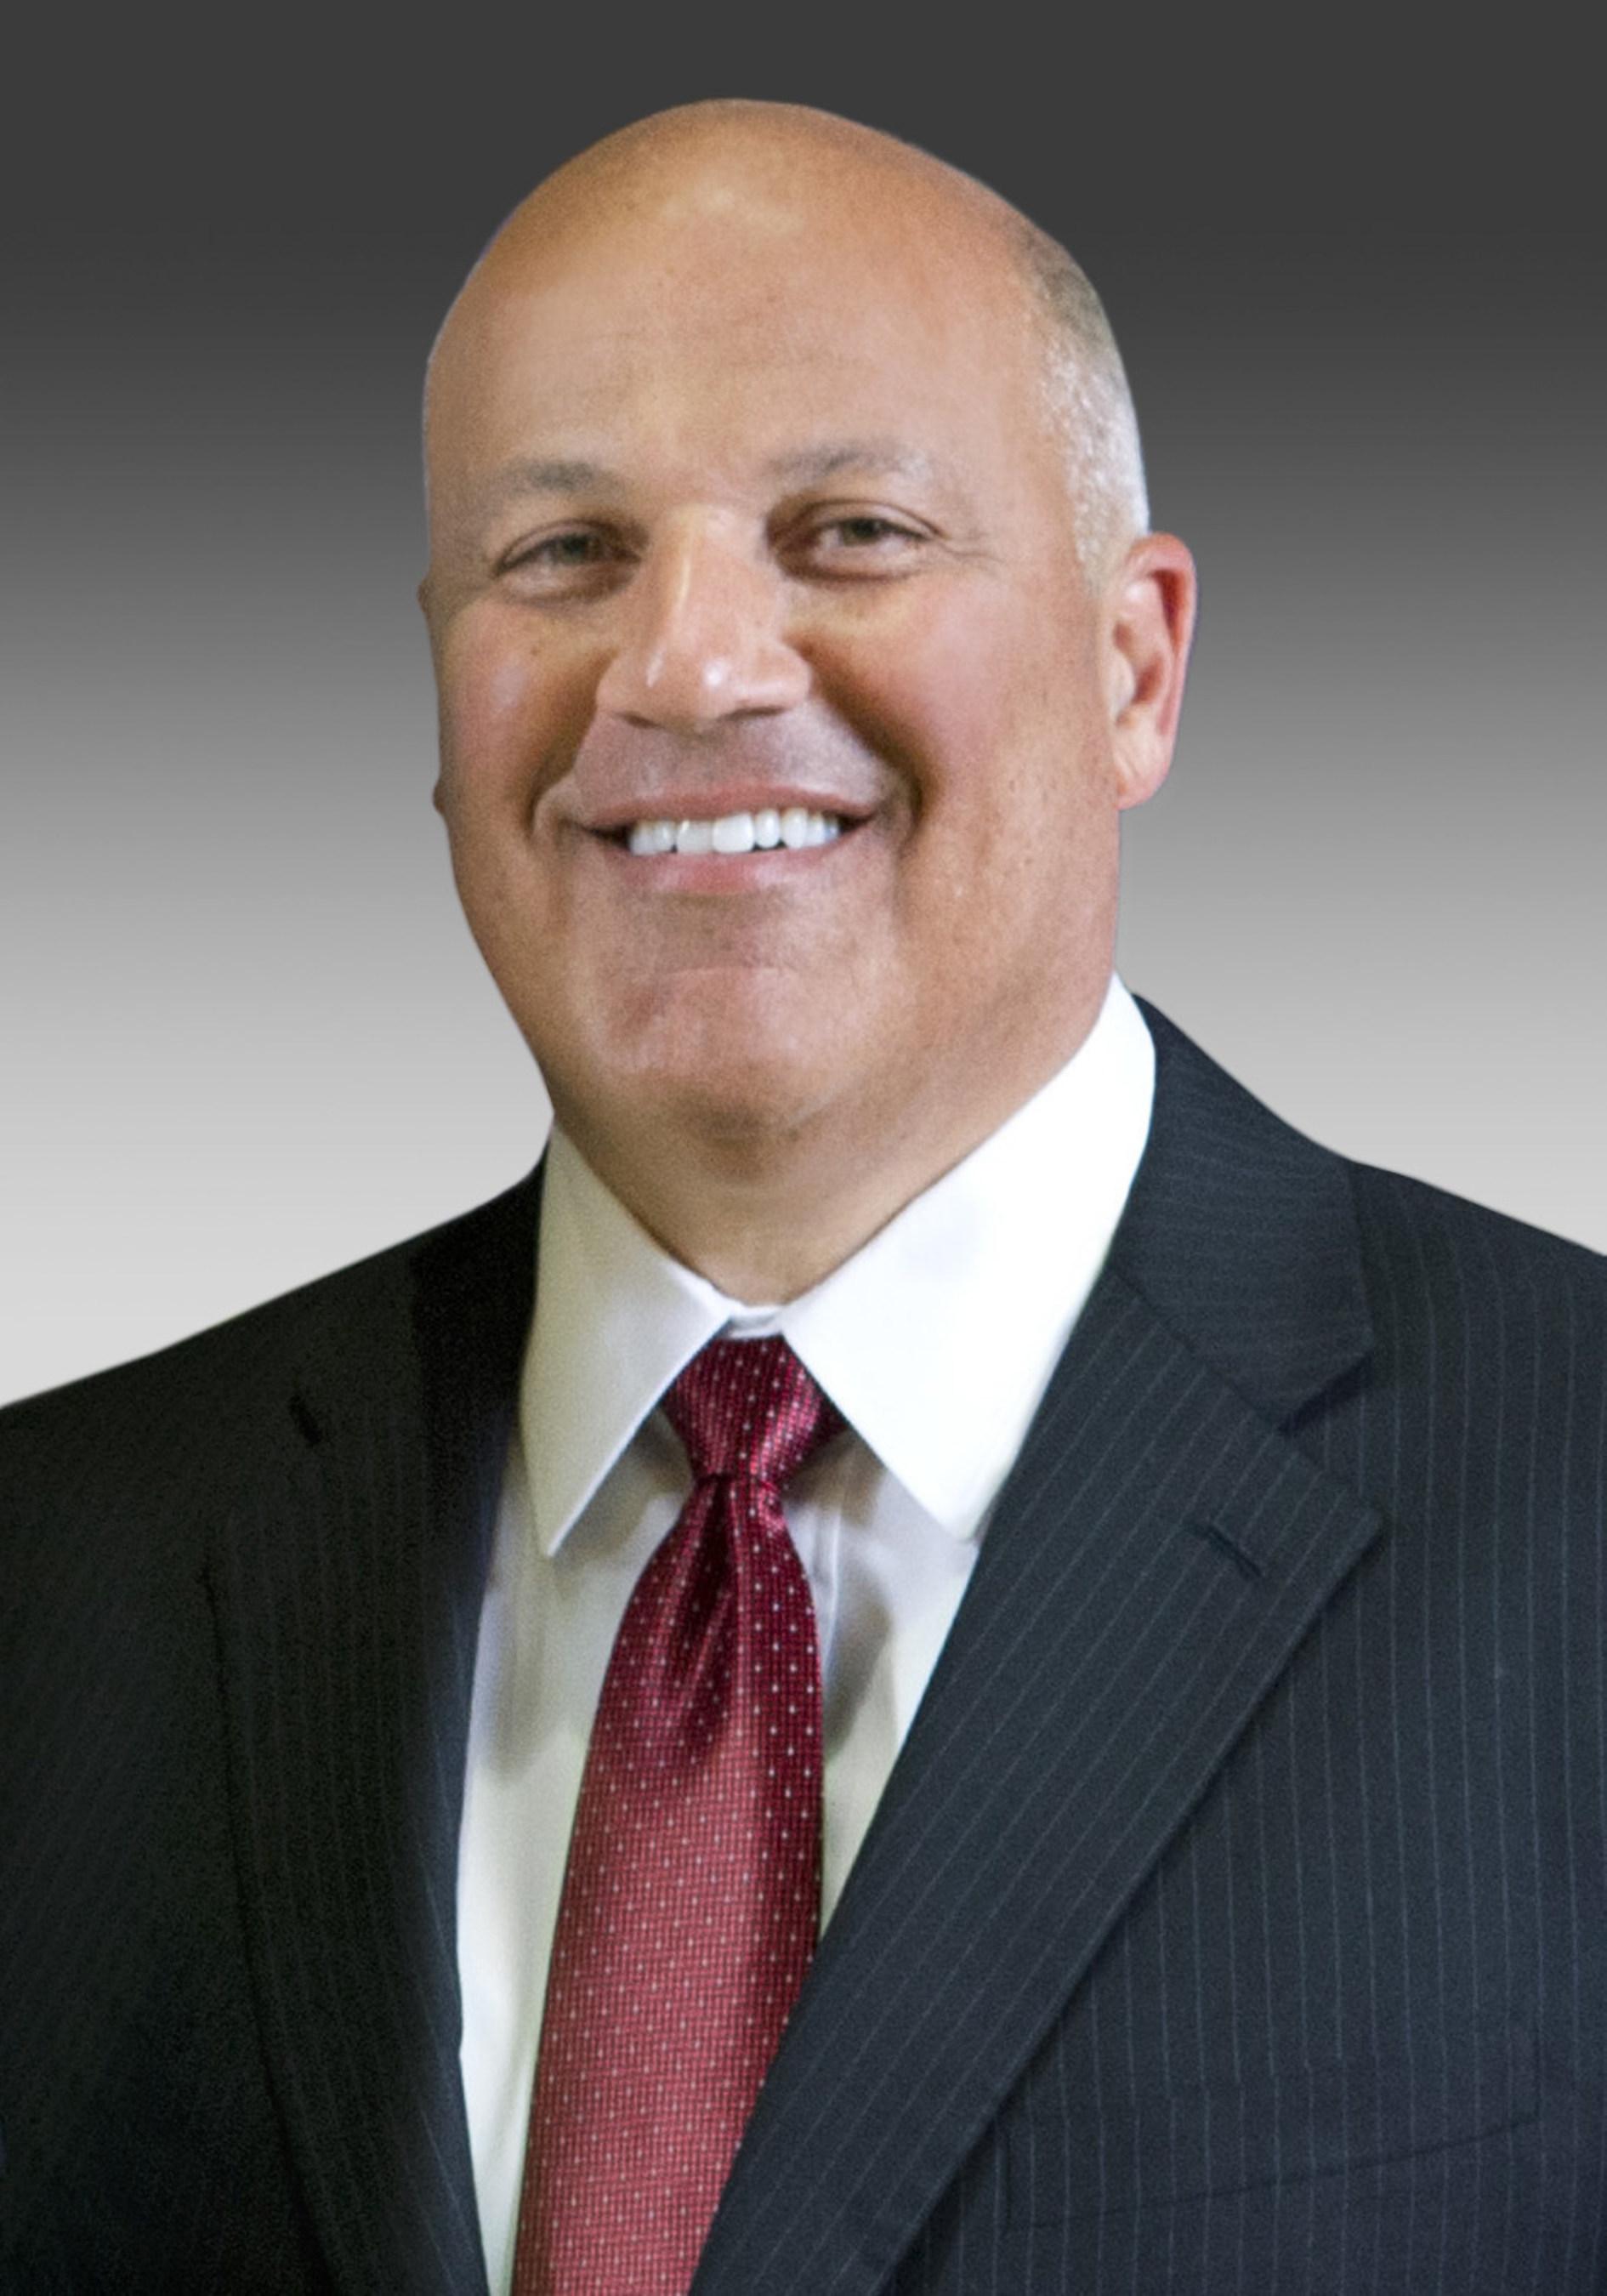 John Morikis